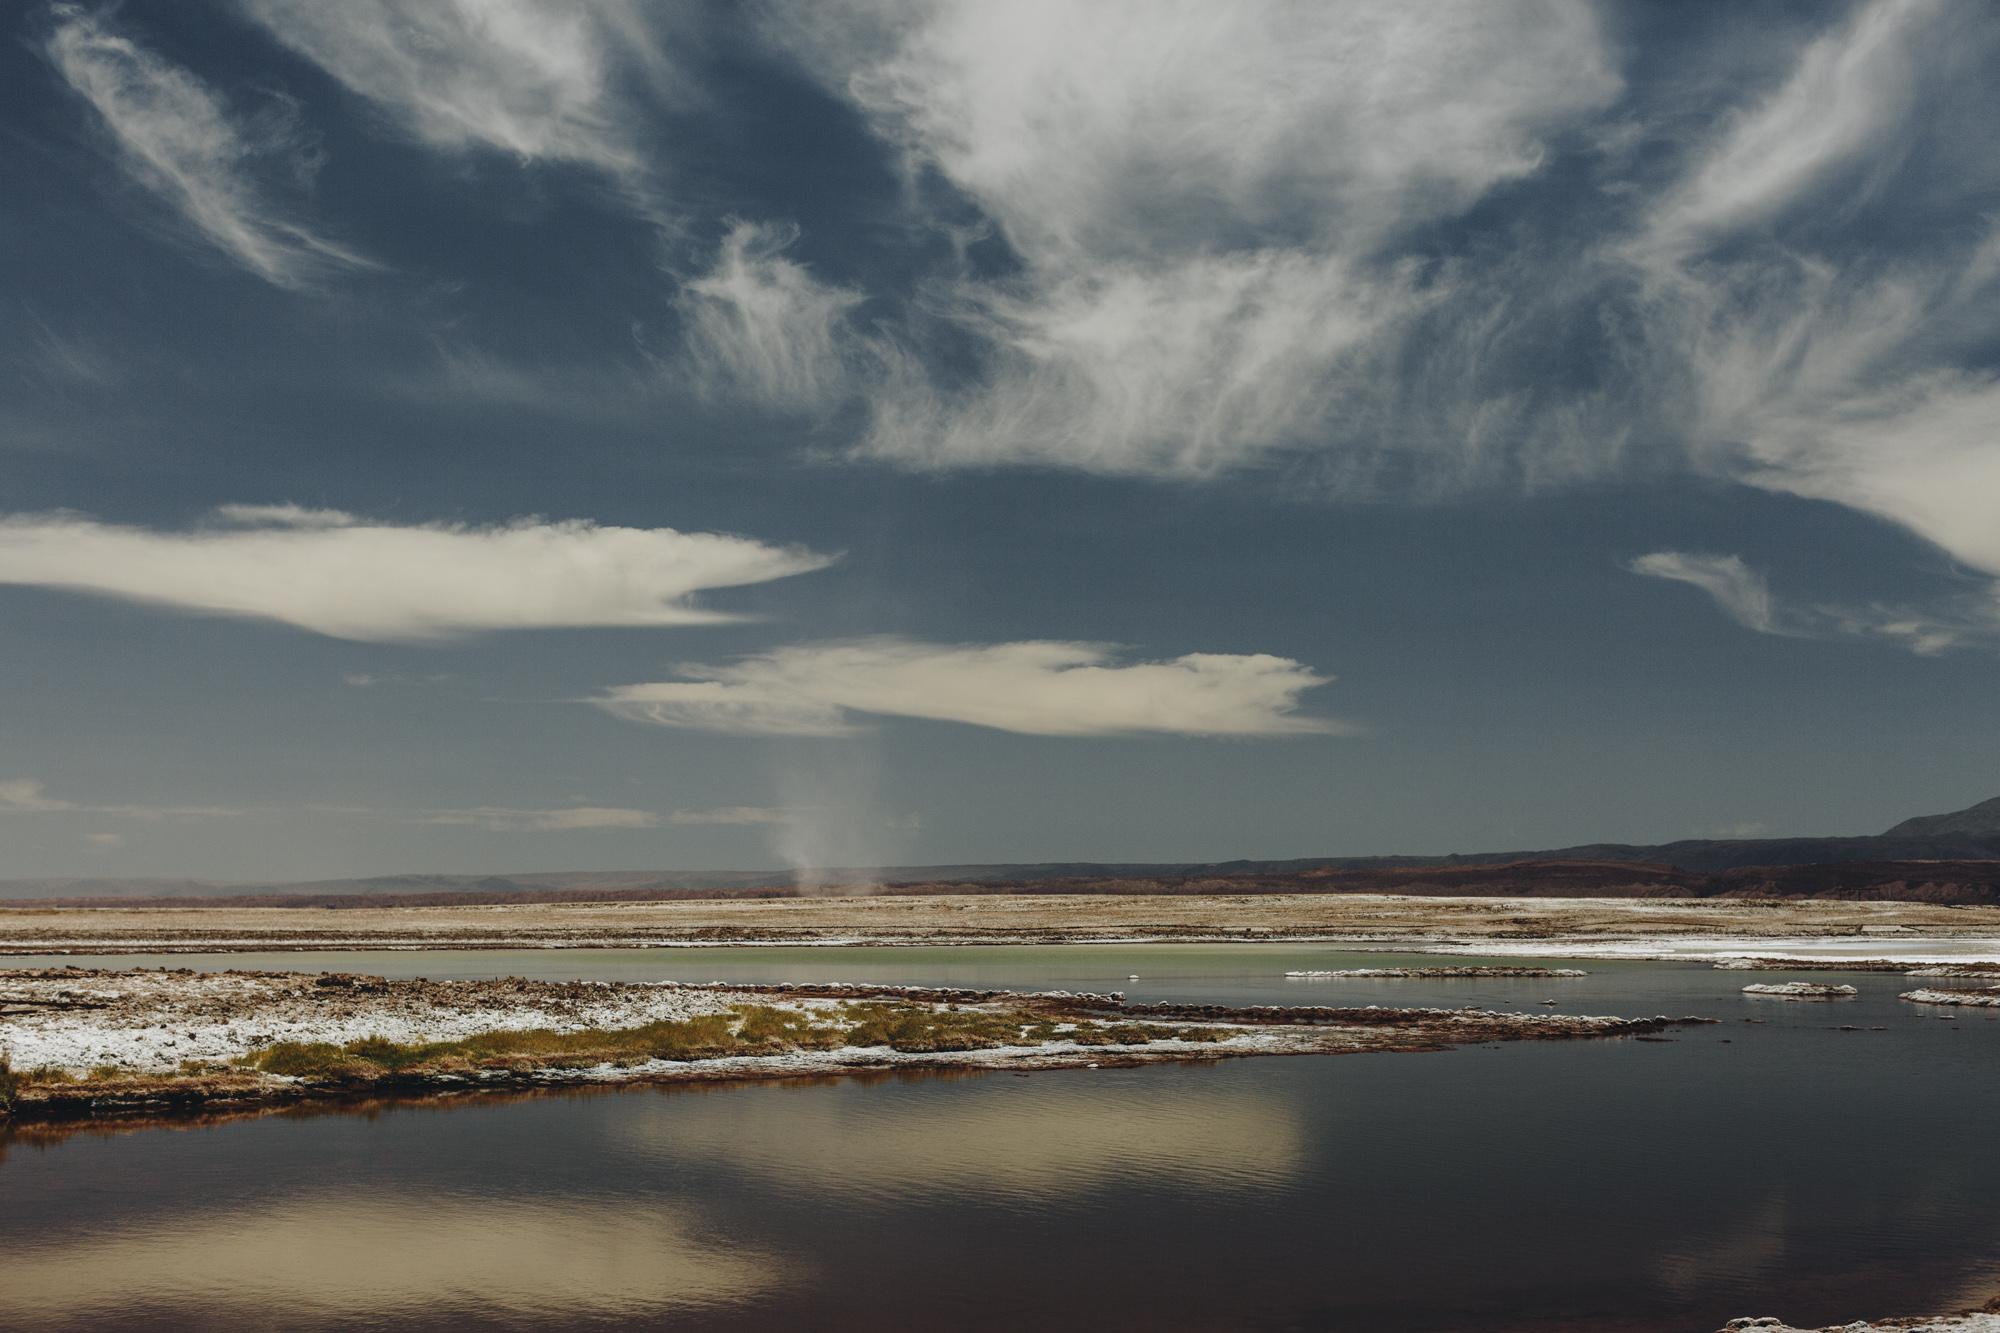 Mael Lambla photographer Chile San pedro atacama desert-109.jpg